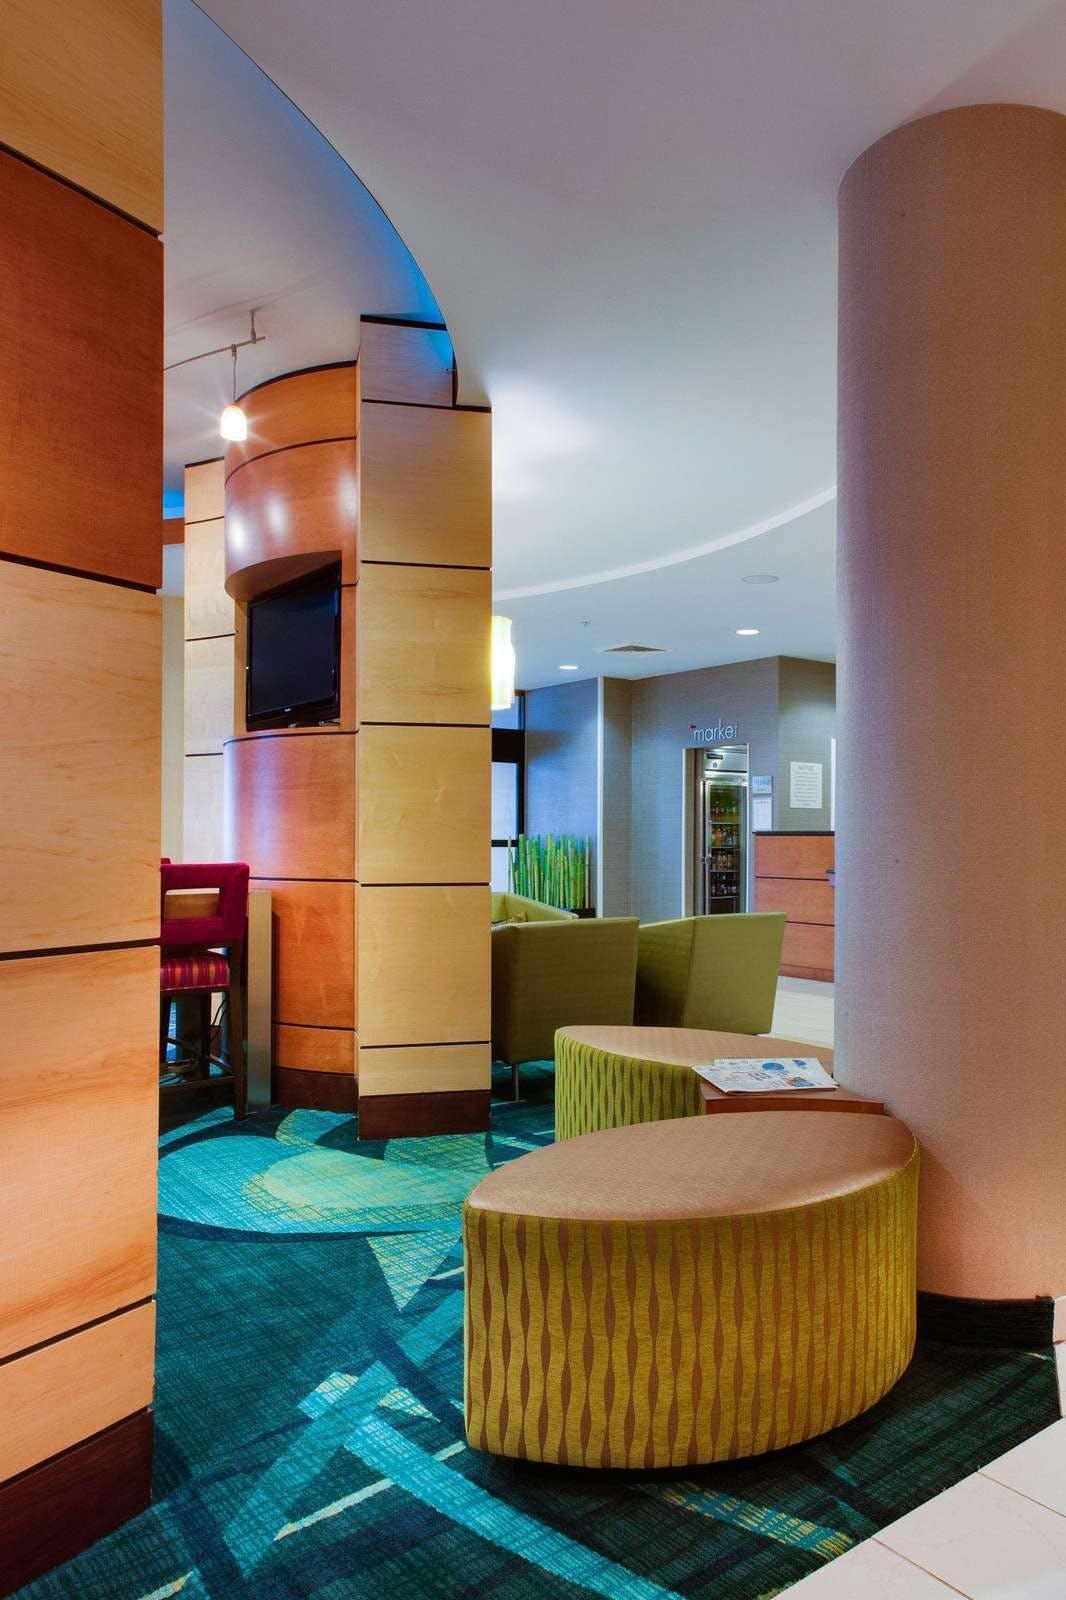 SpringHill Suites by Marriott Savannah Airport